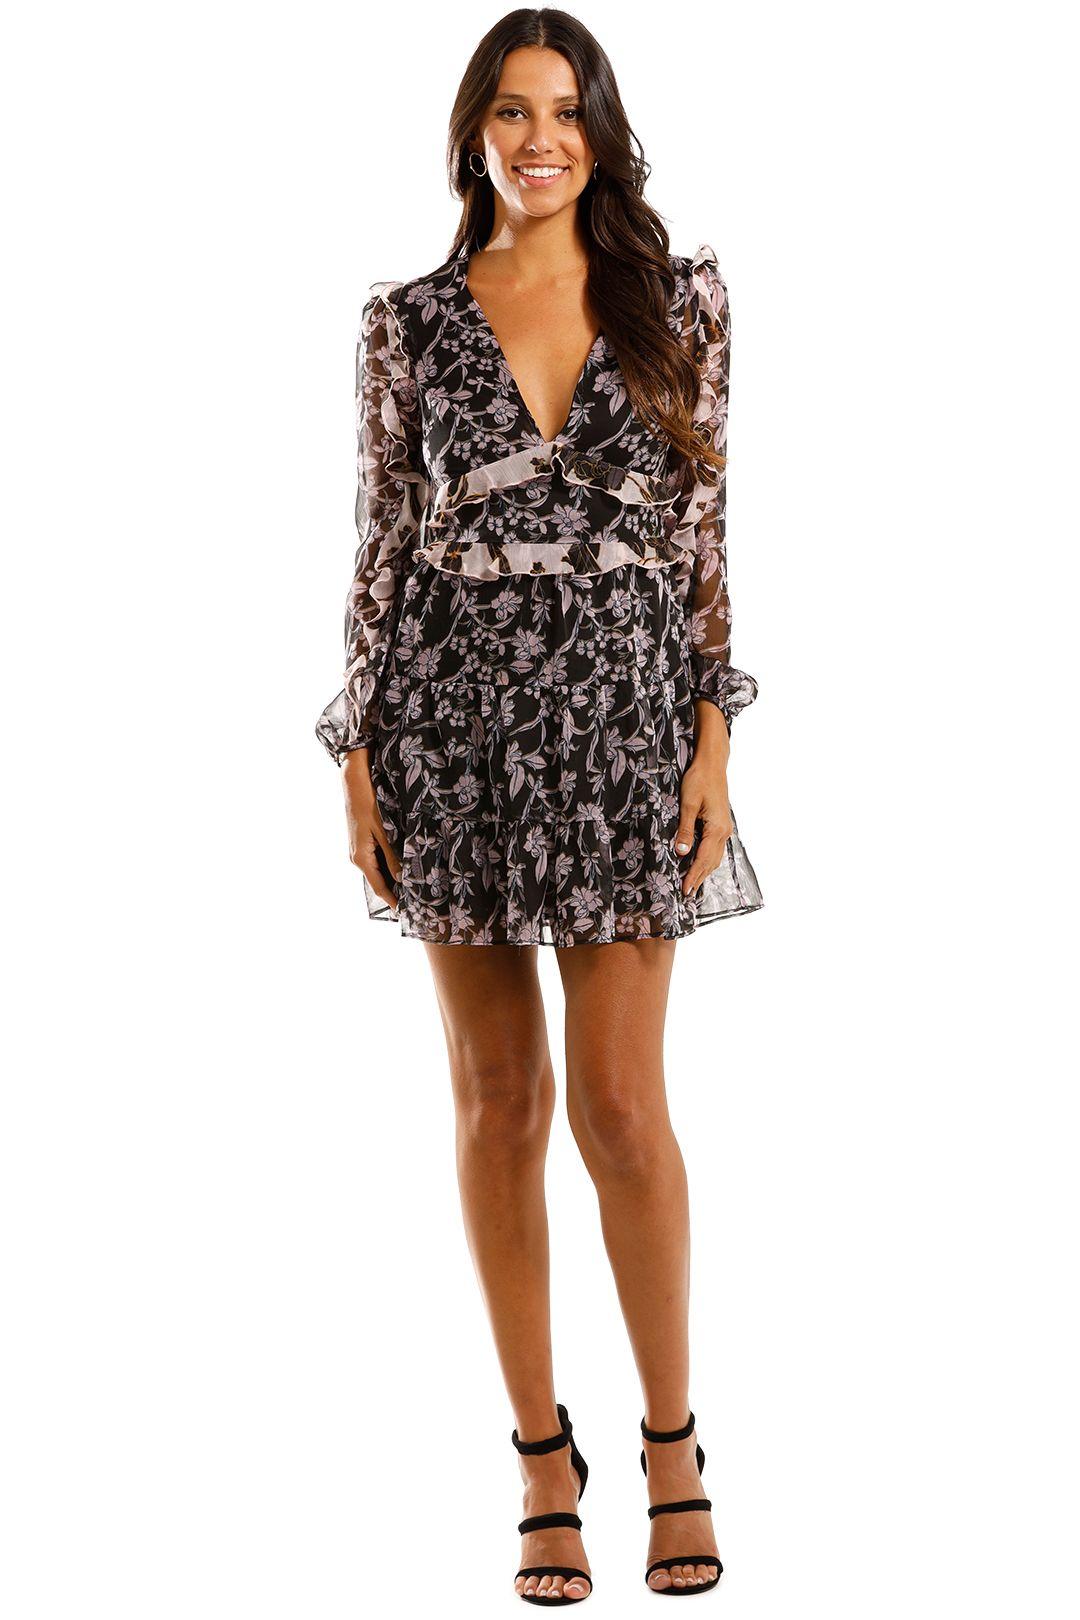 Talulah Blooming LS Mini Dress Patchwork